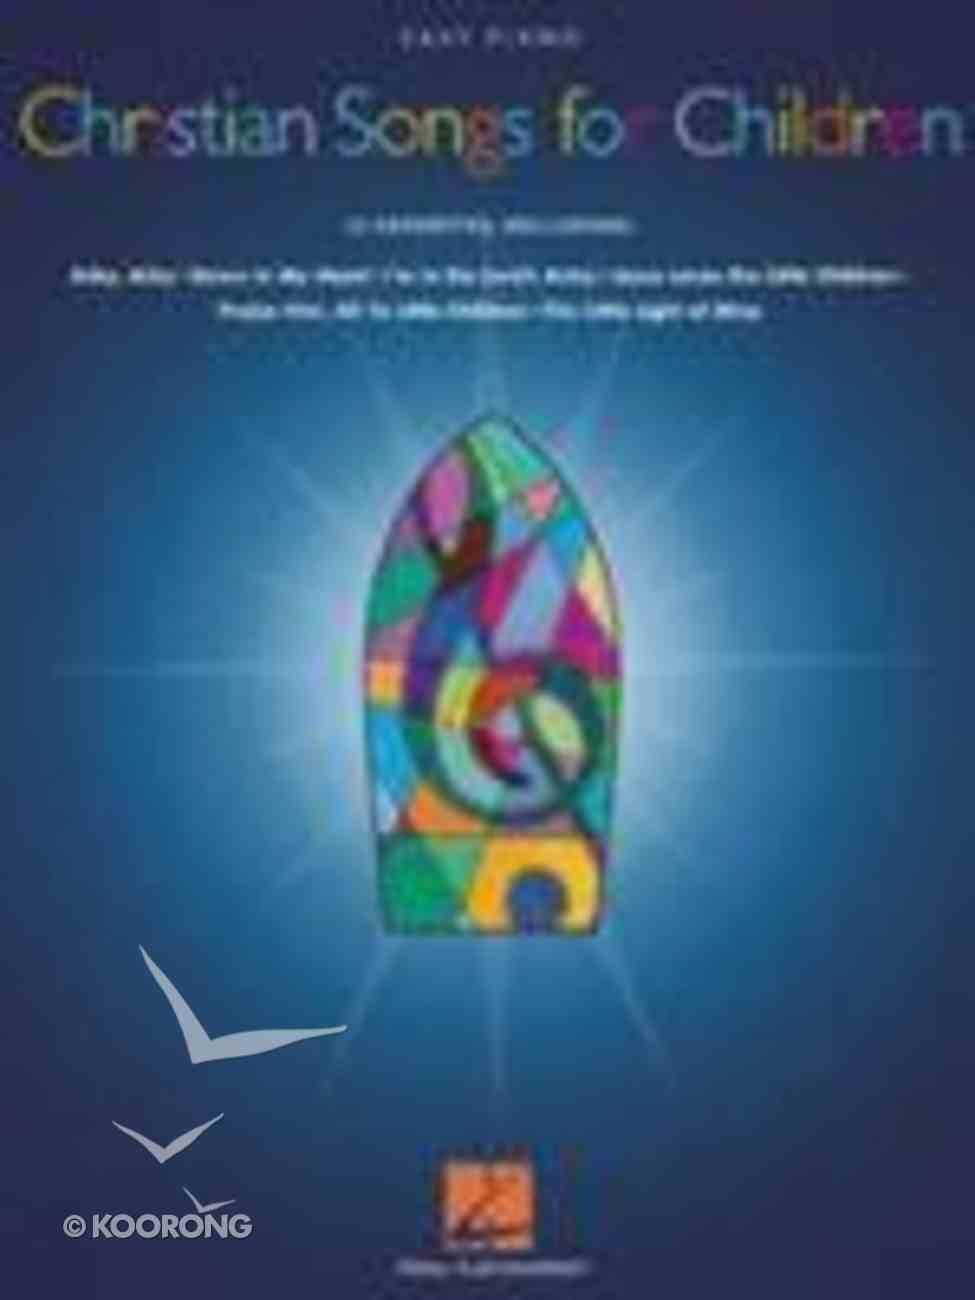 Christian Songs For Children - Easy Piano Paperback